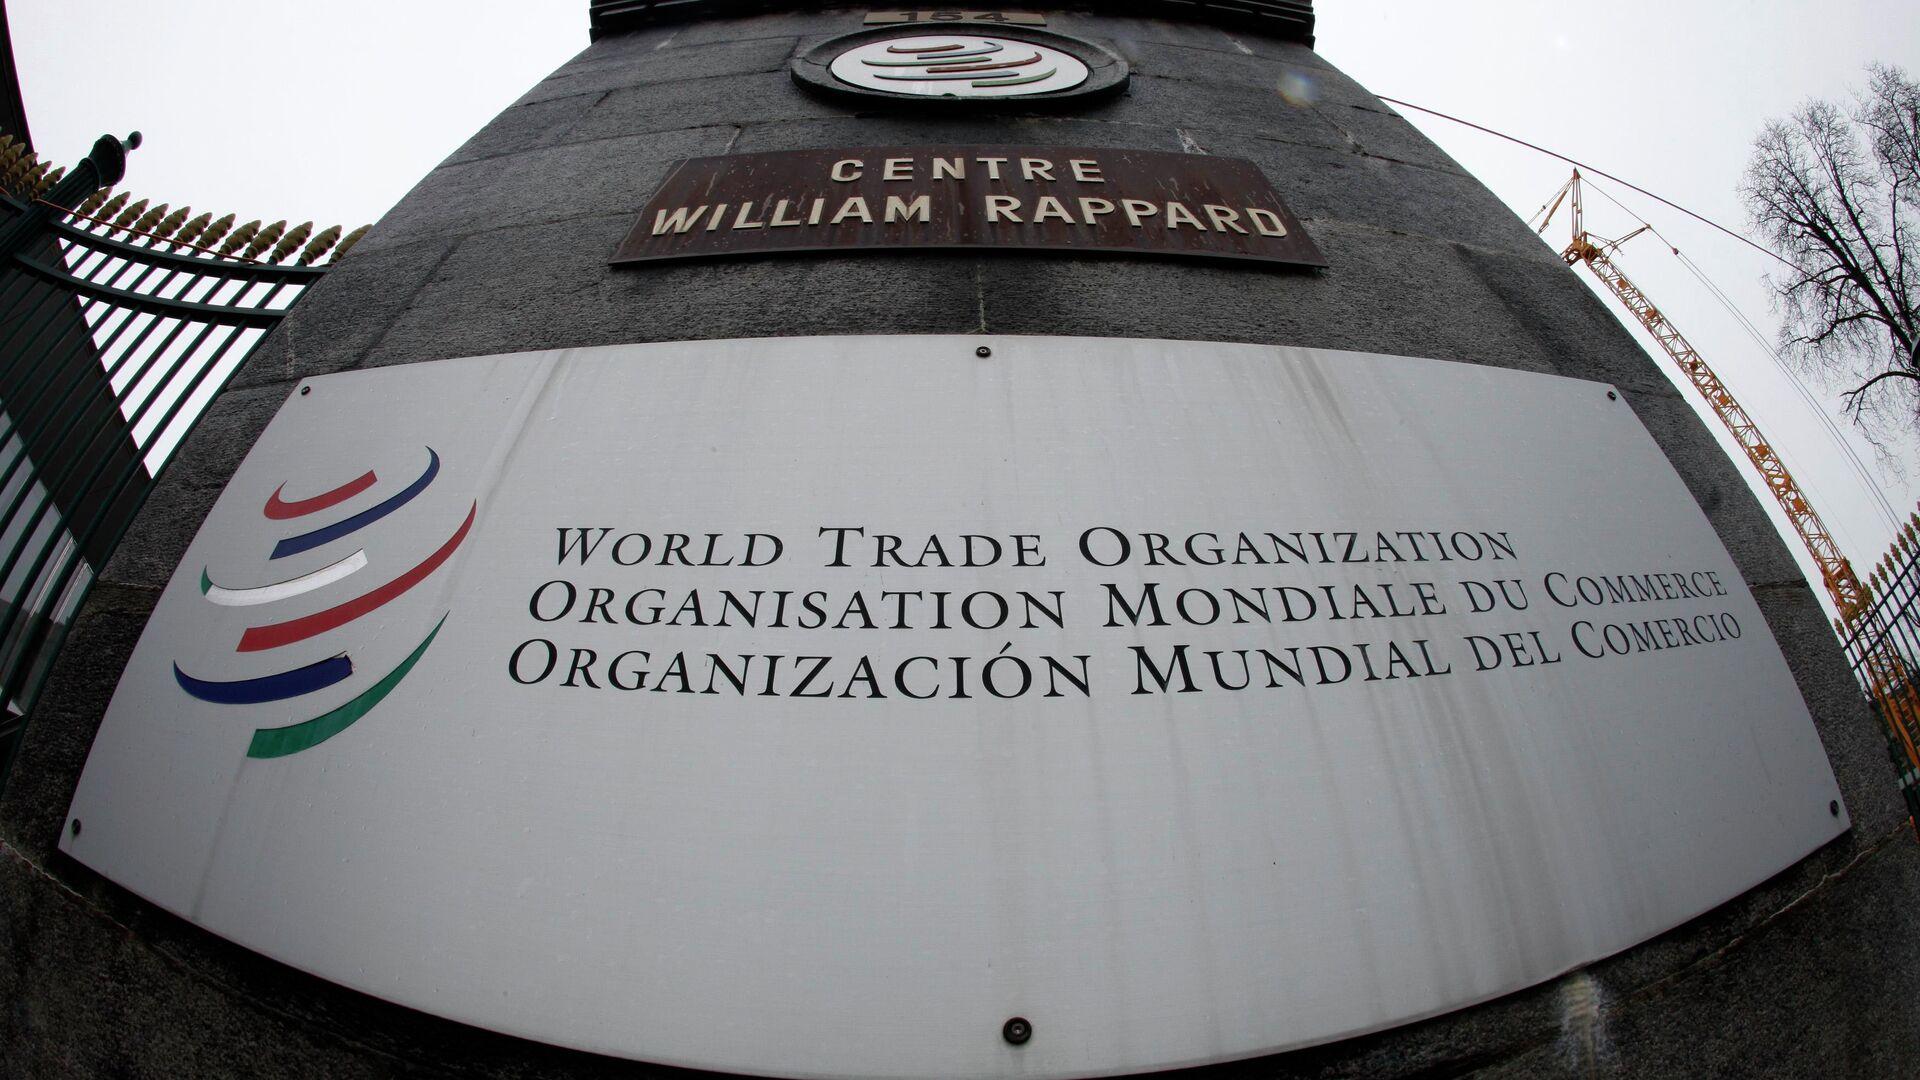 Sede de la OMC en Ginebra, Suiza - Sputnik Mundo, 1920, 26.03.2021